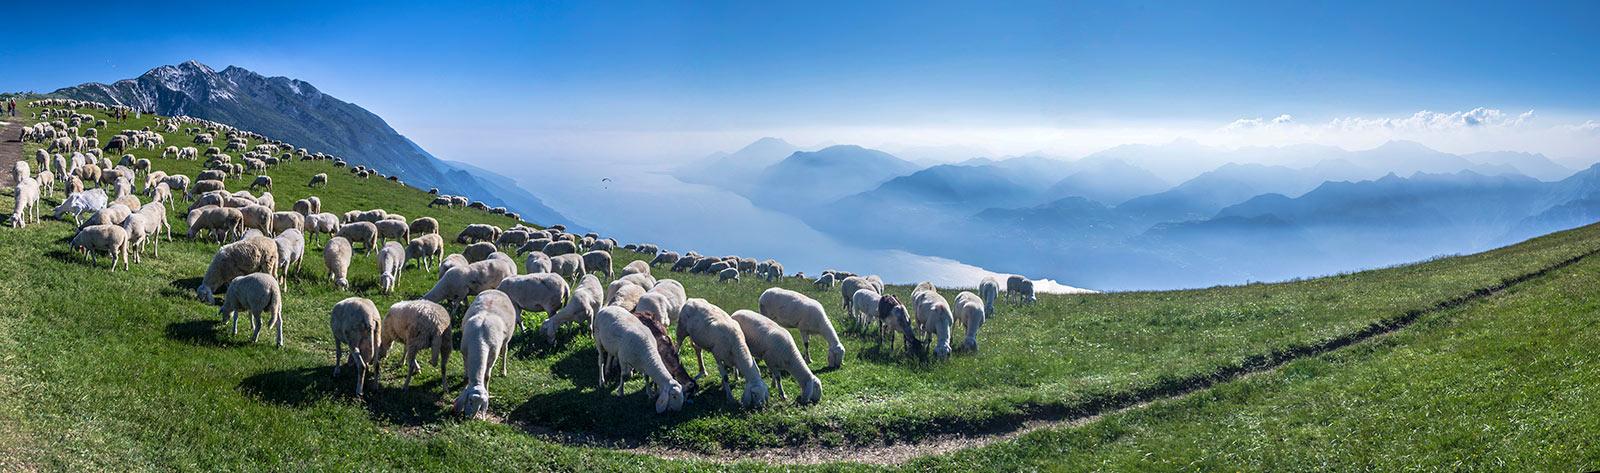 Monte Baldo Malcesine Gardasee